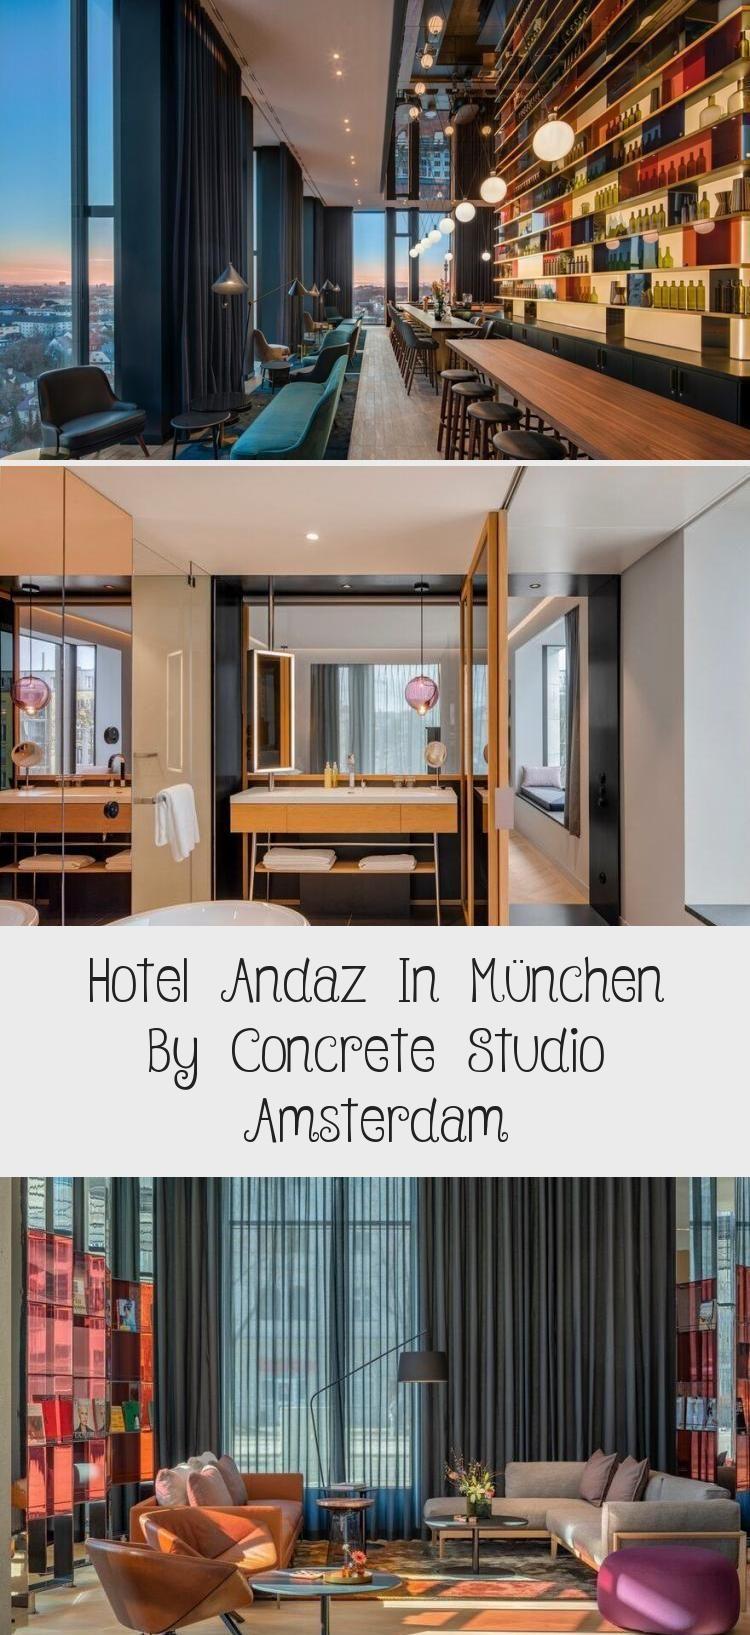 Hotel Andaz In Munchen By Concrete Studio Amsterdam Logodesignnature Bakerylogodesign Logodesignanimal In 2020 Hotel Logo Design Luxury Logo Design Logo Design Diy